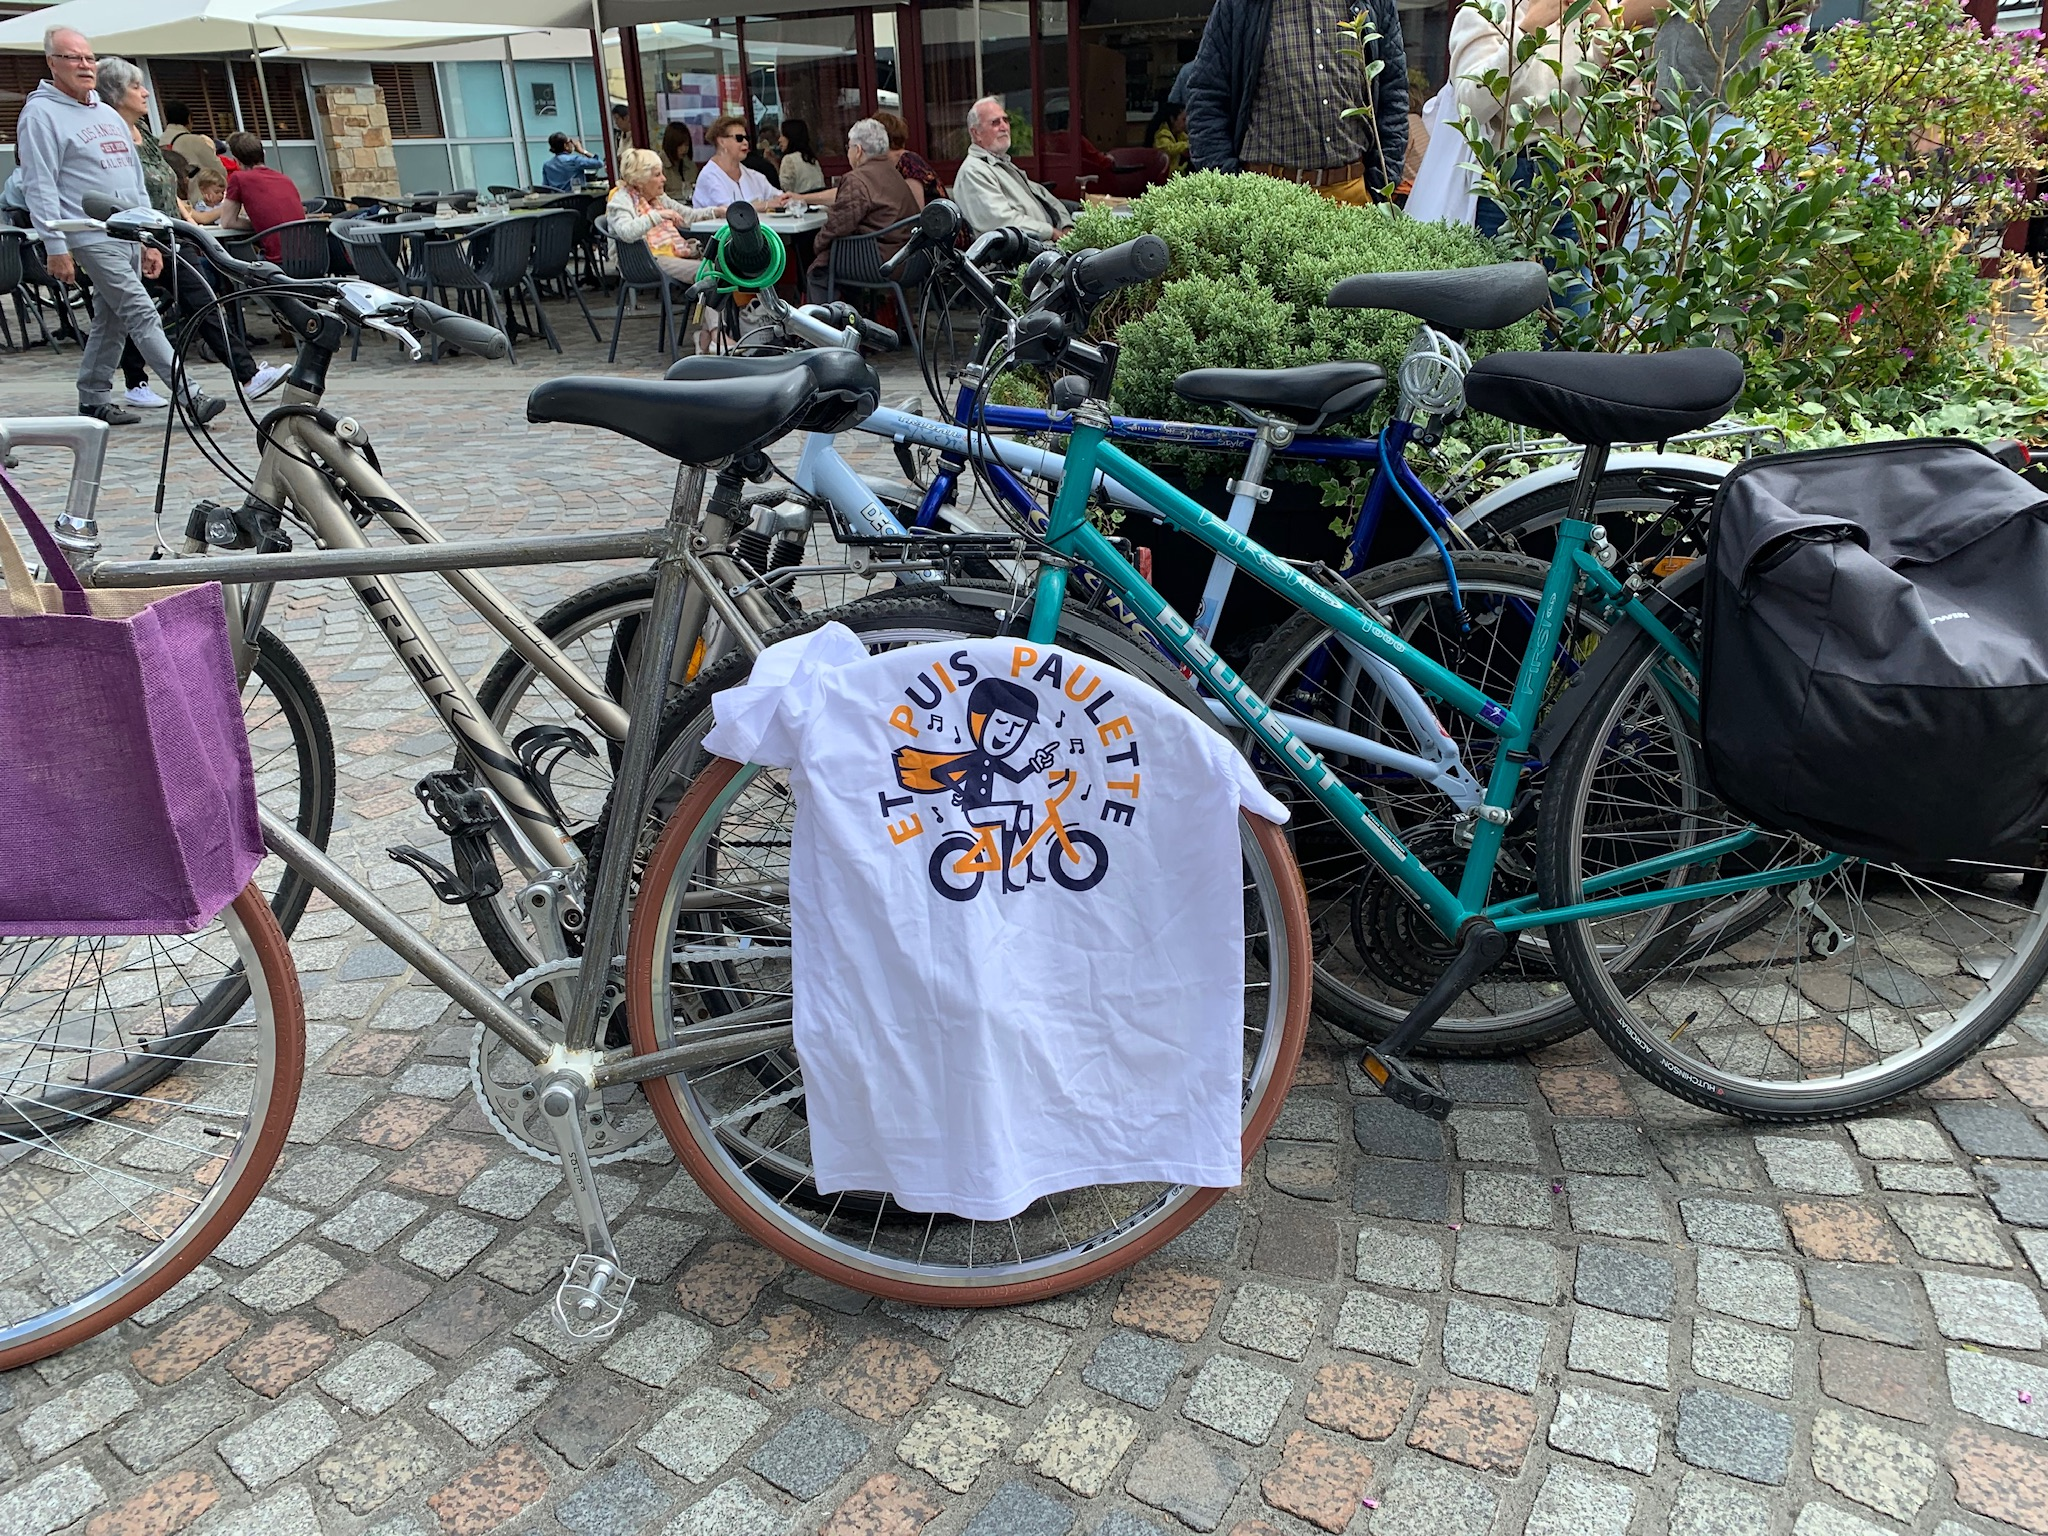 Eric van walleghem – Garage à Vélo